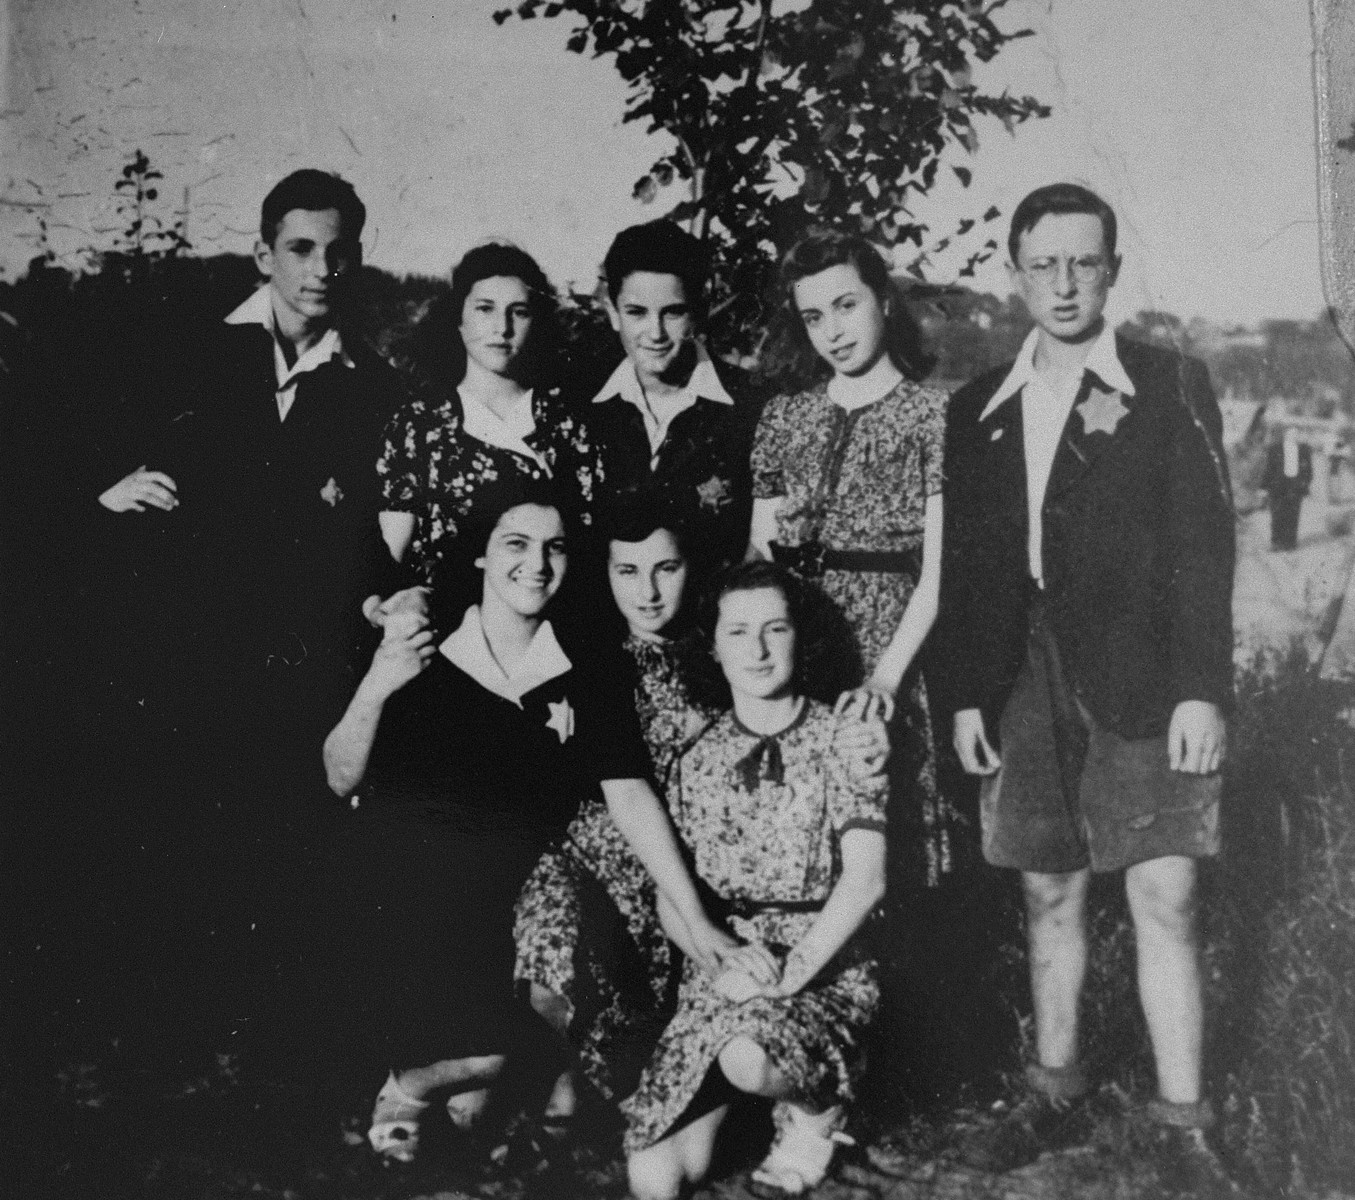 Members of the Irgun Brit Zion Zionist youth movement in the Kovno ghetto.  Standing from left to right are:  Avraham Gurwitz; Miriam Rogol (now Pfeffer); Moshe (Avraham?) Nadel; Lea Sokolsky; Aharon Rozin.  Kneeling from left to right are: Mina Kaminsky (now Shafir); Rivka Rogol; Ester Gottfarstein.